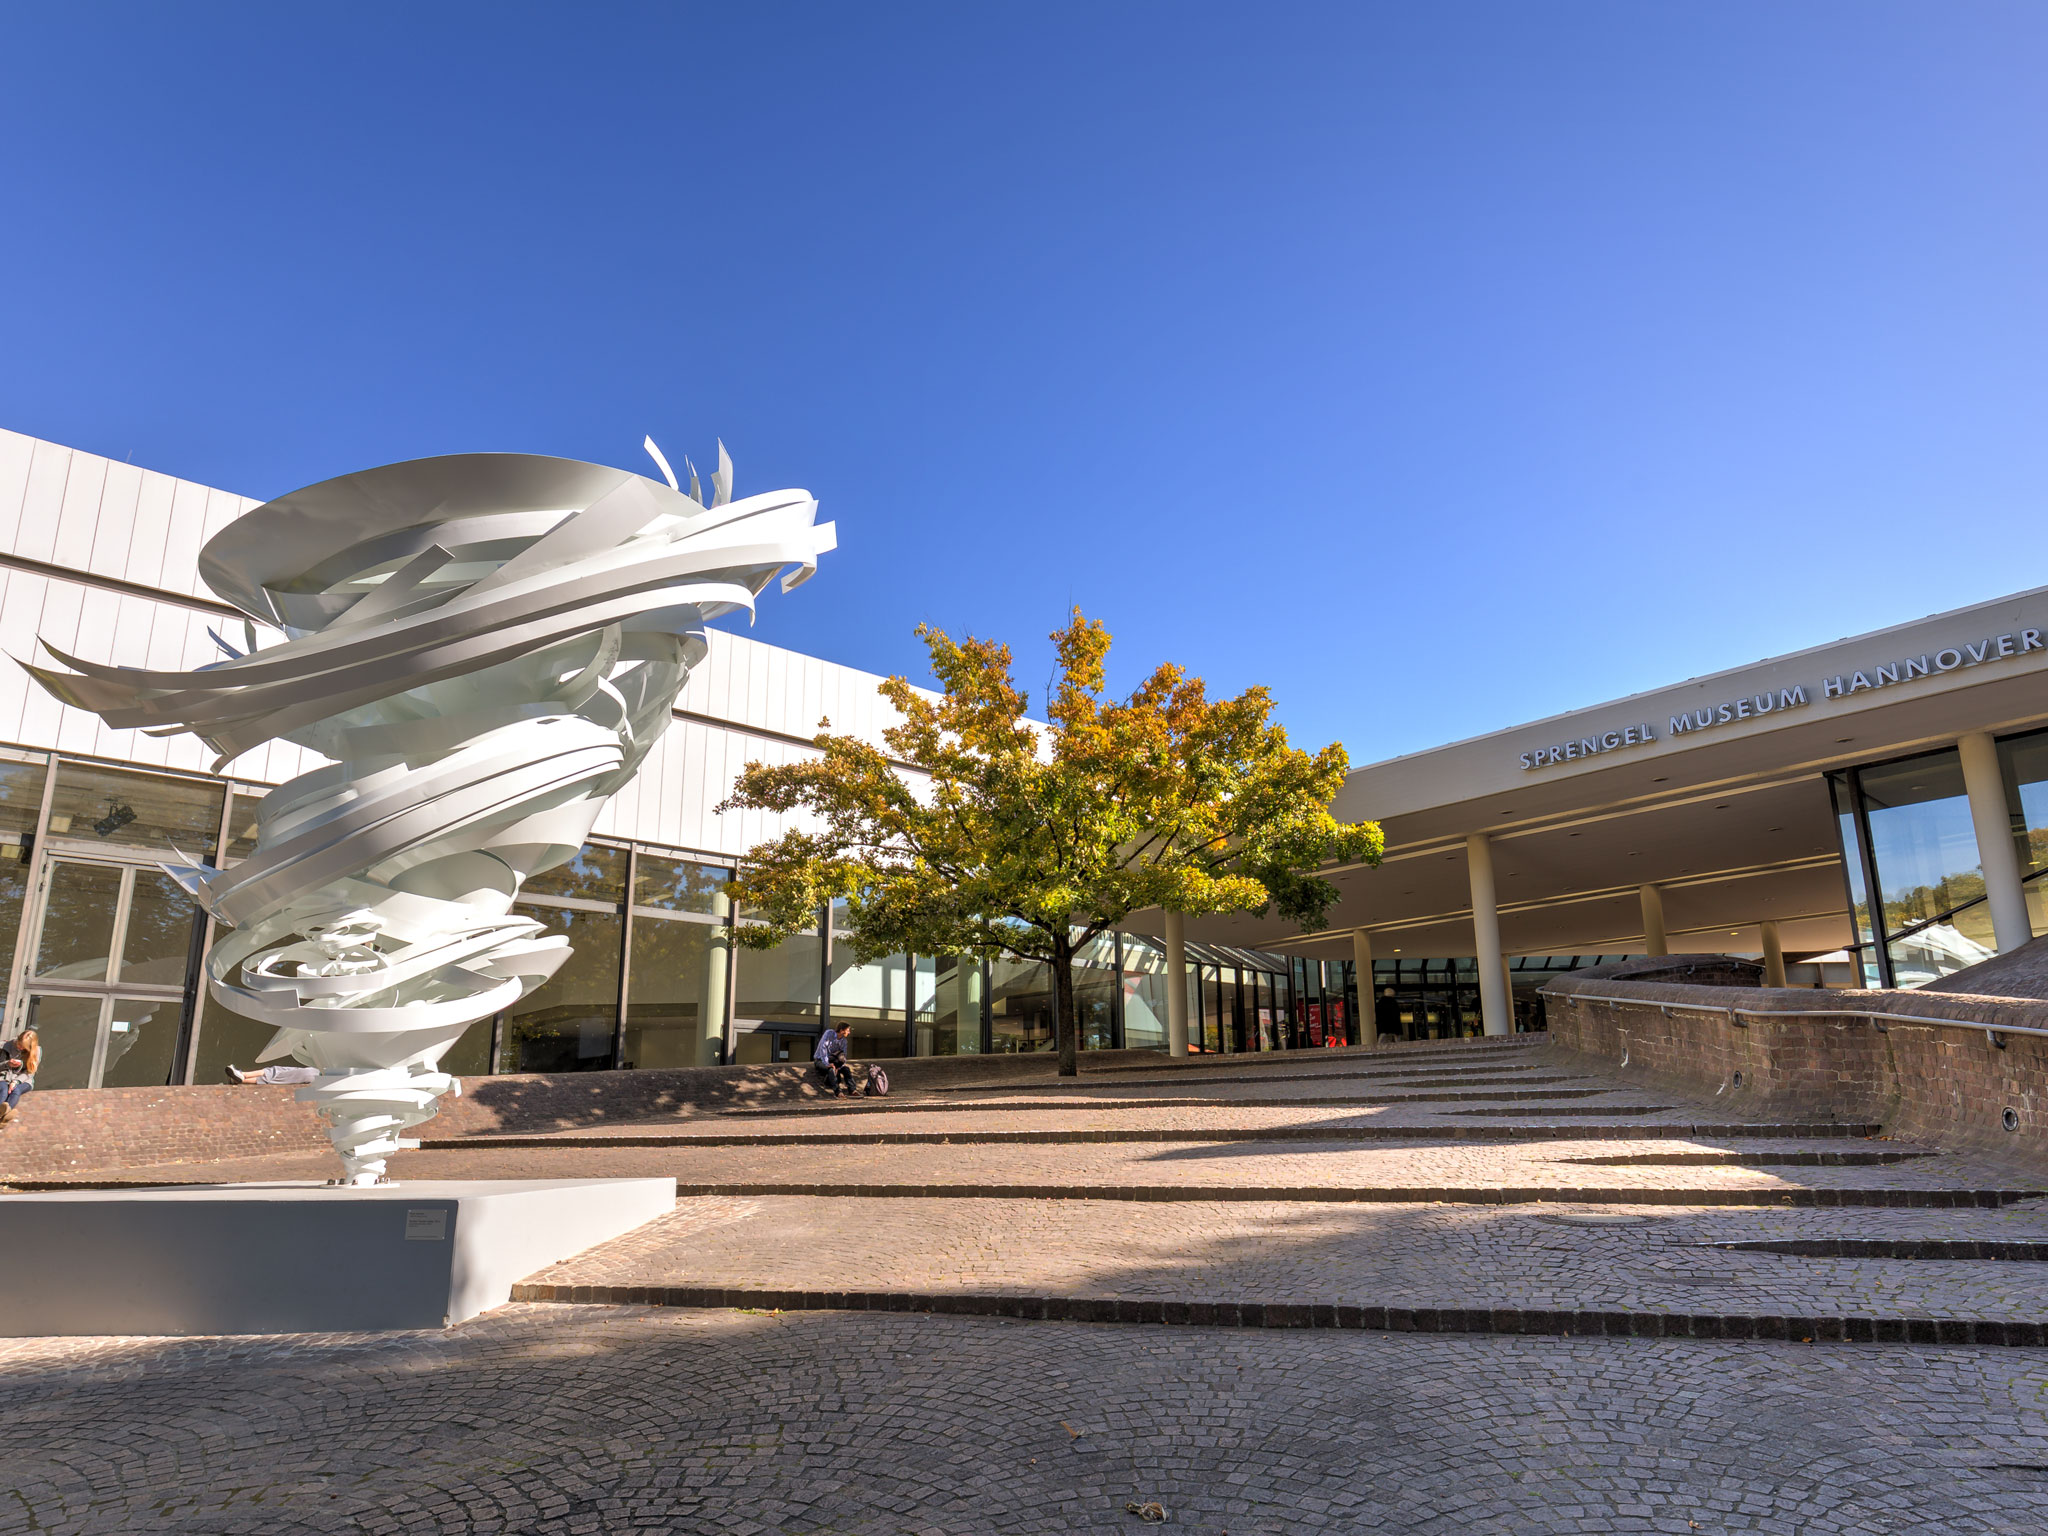 Sprengel Museum Hannover / Twister